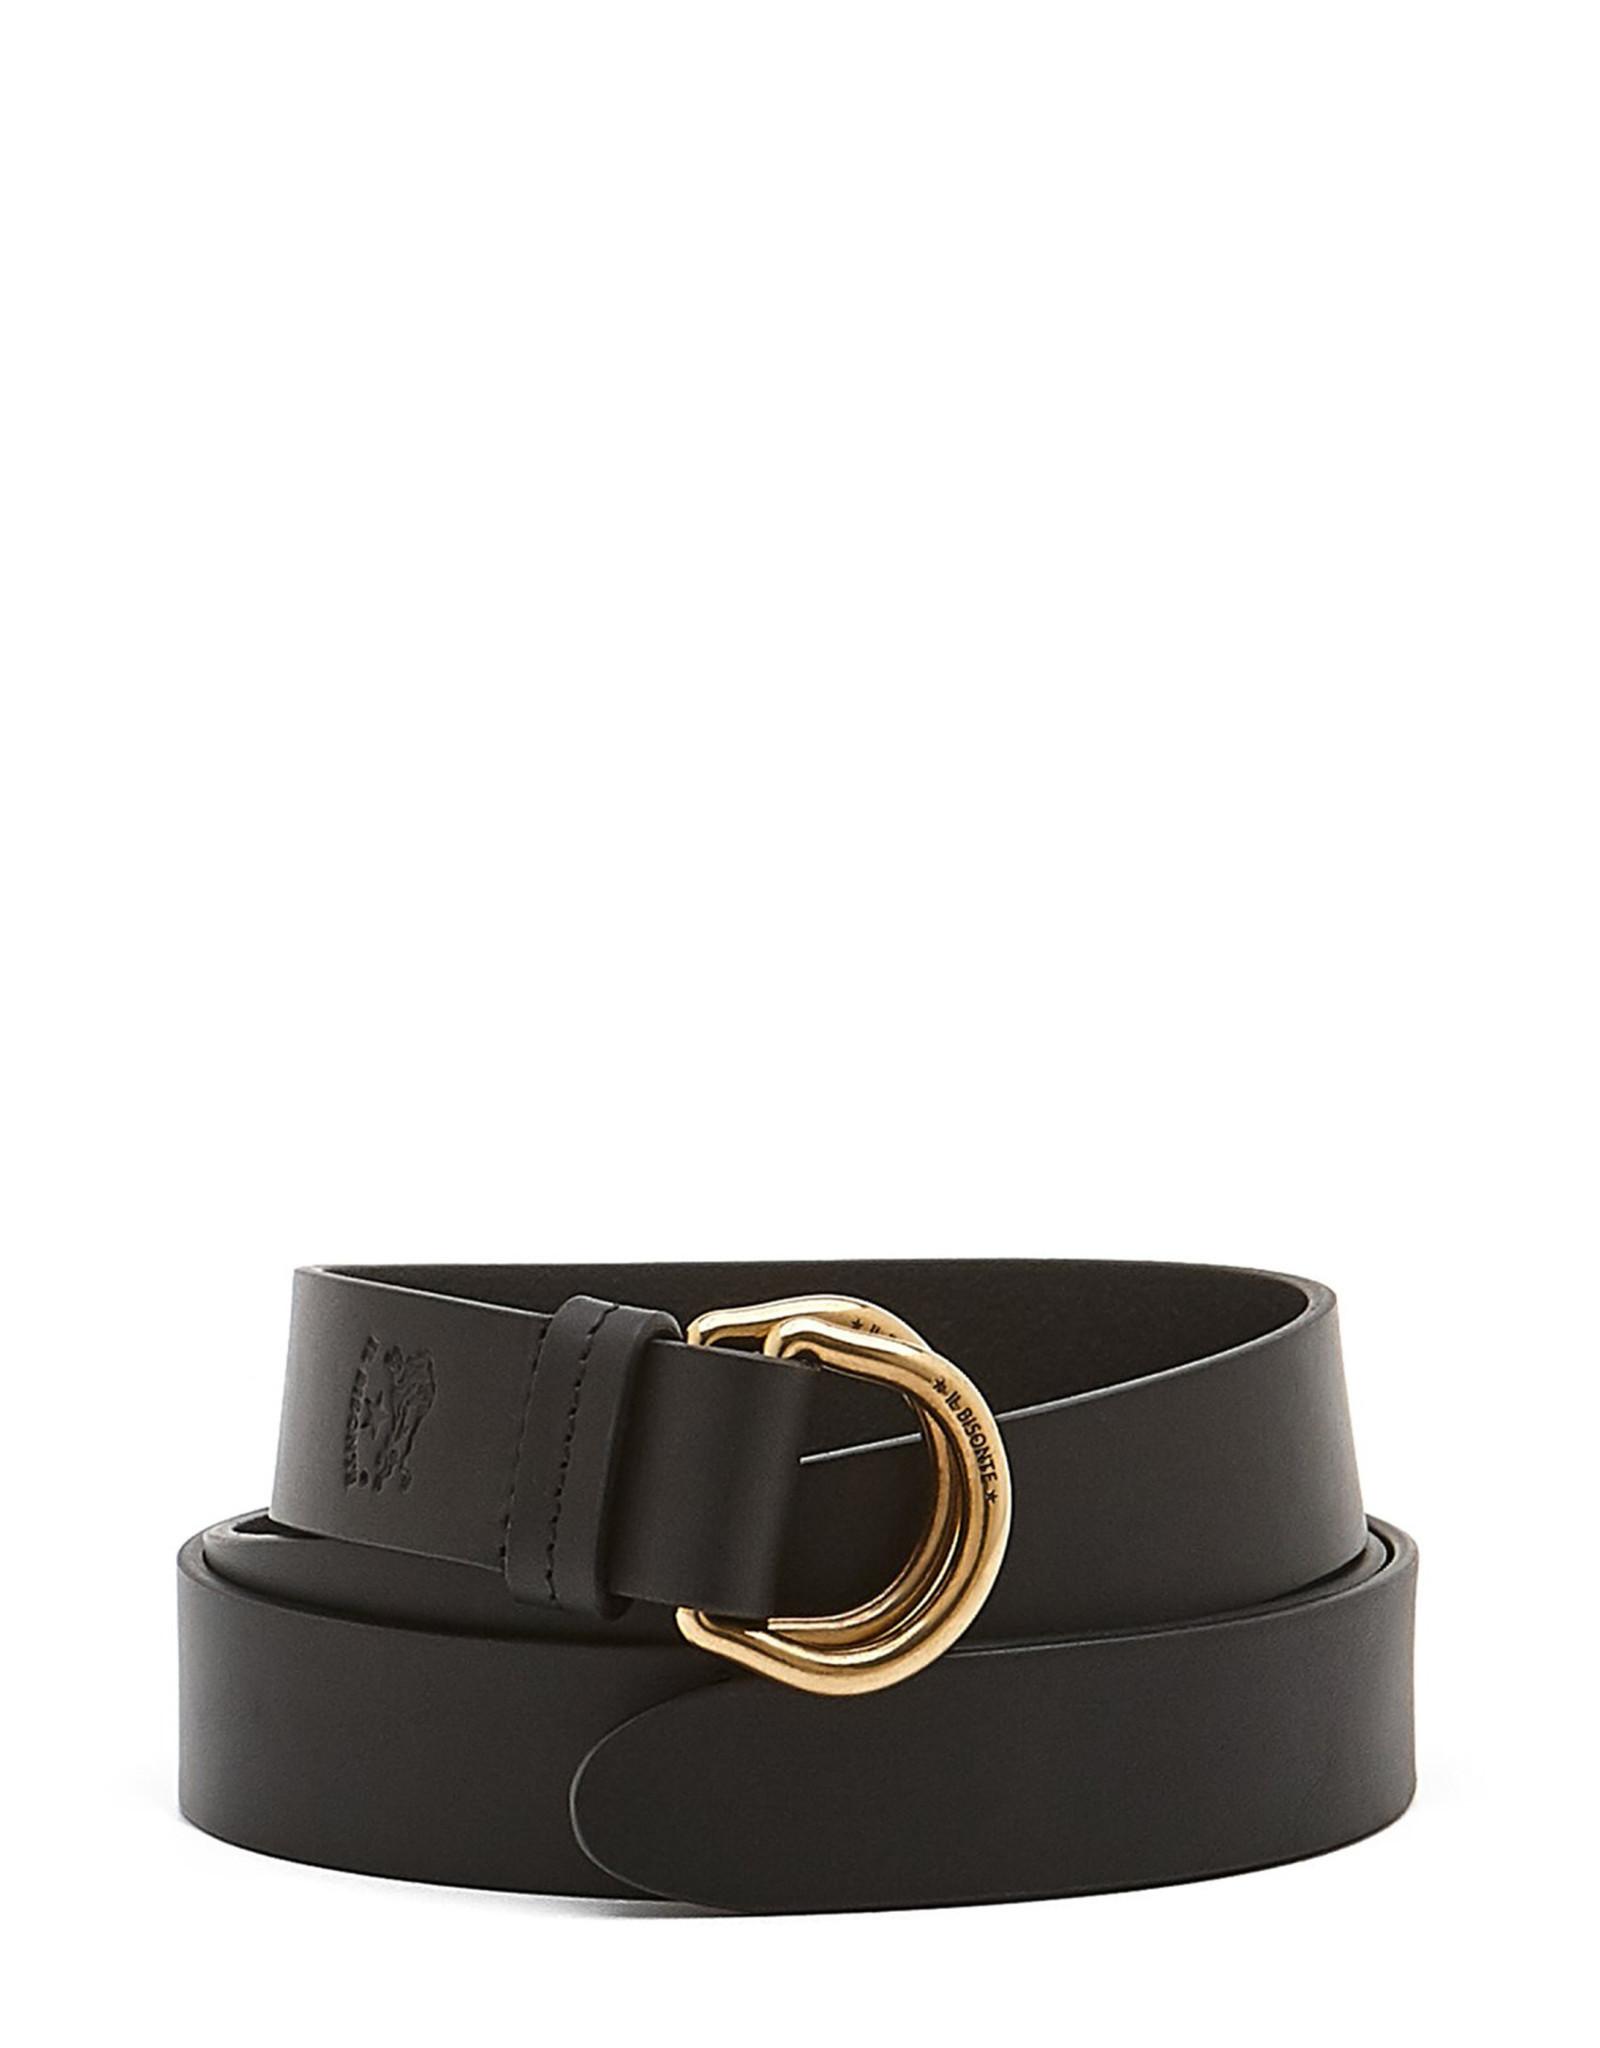 IL BISONTE - Leather Belt